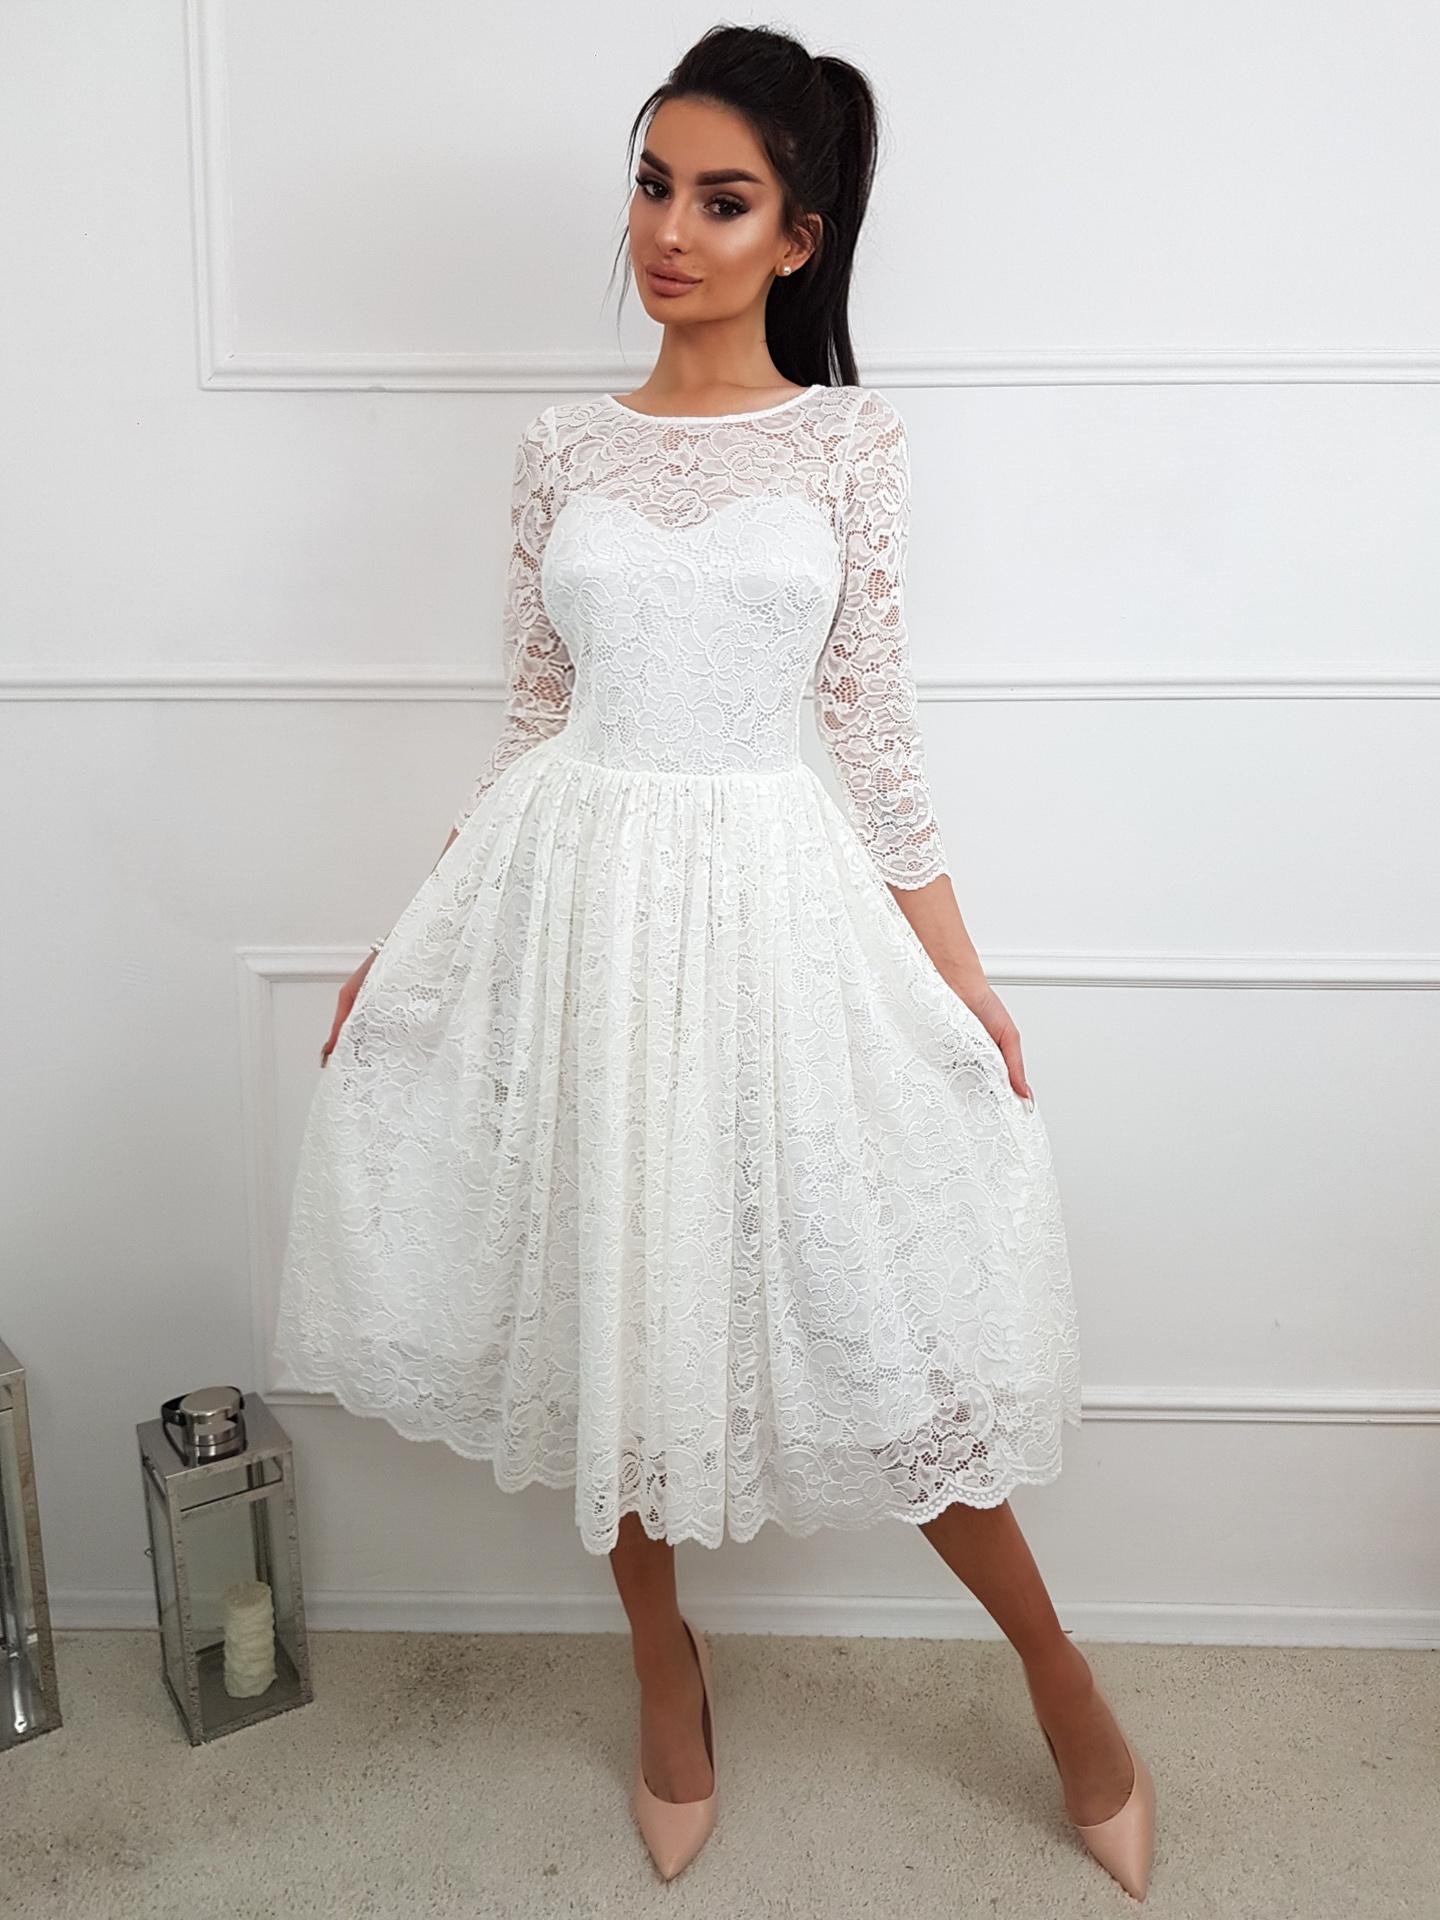 fce6368c05 Carla- Koronkowa sukienka midi KM302-4 - ❤ Kartes-Moda ❤